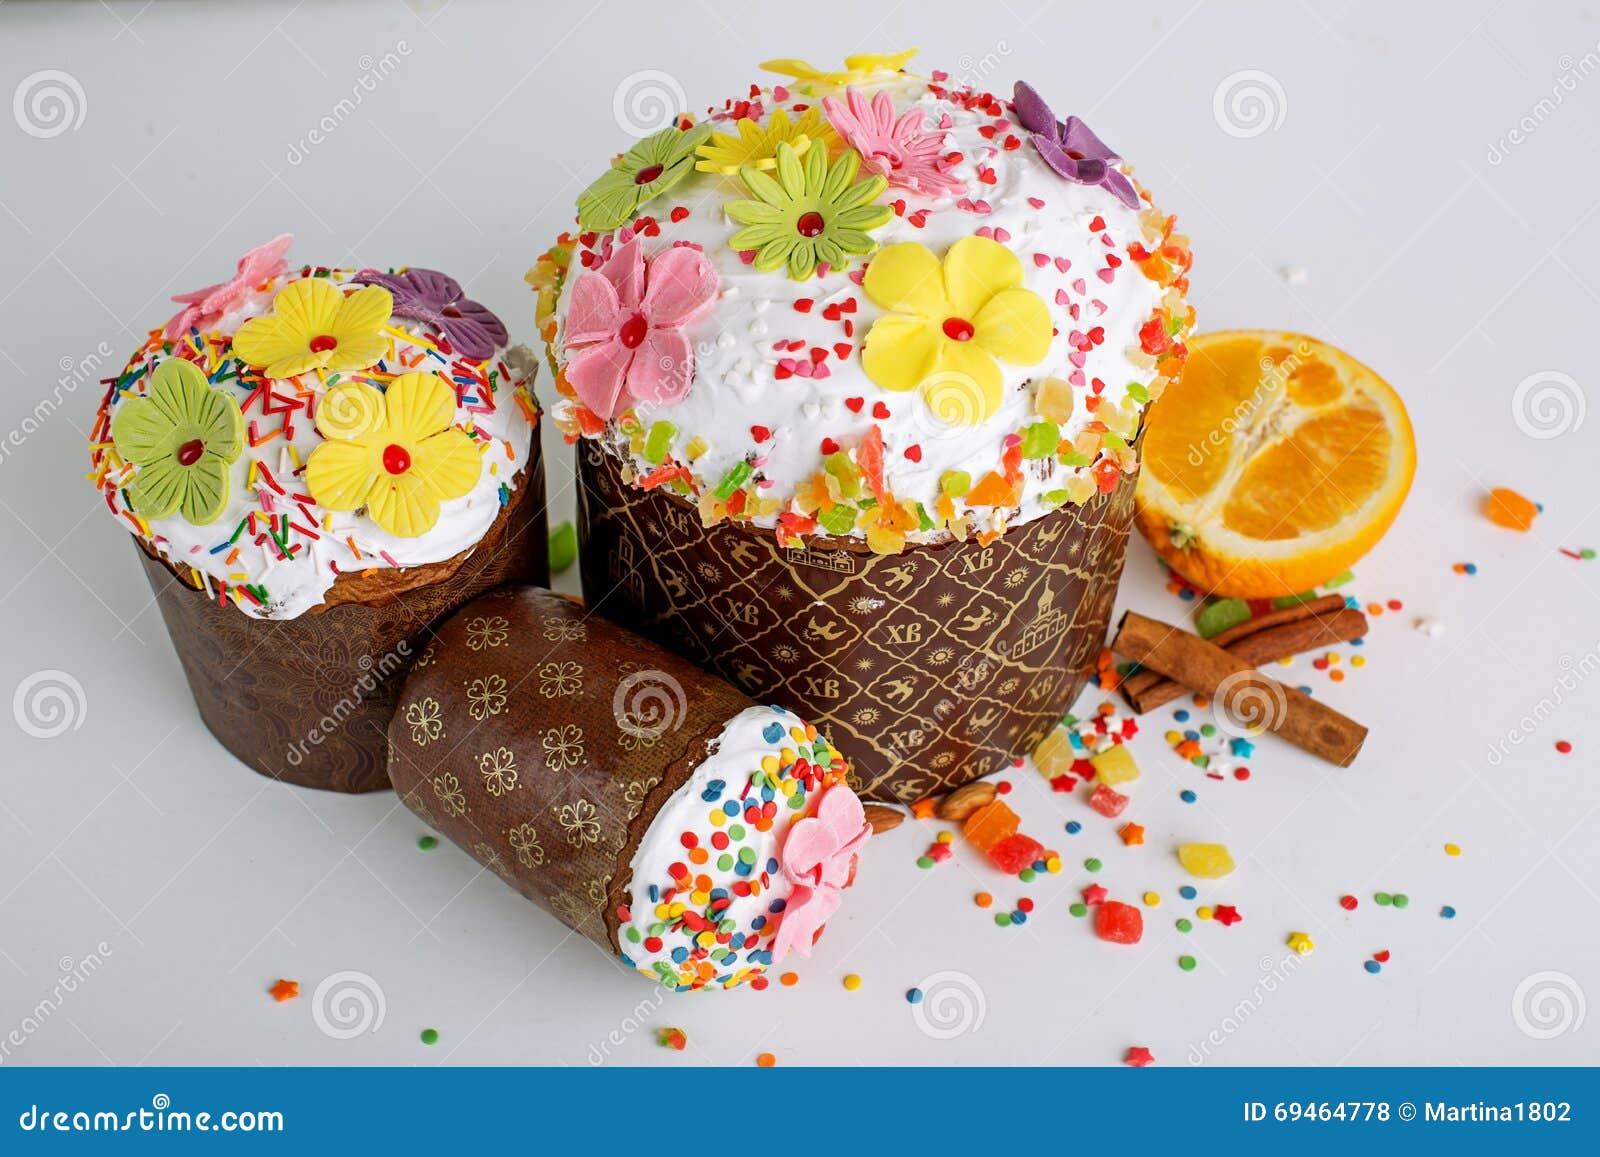 Italian Fruit Cake Panettone